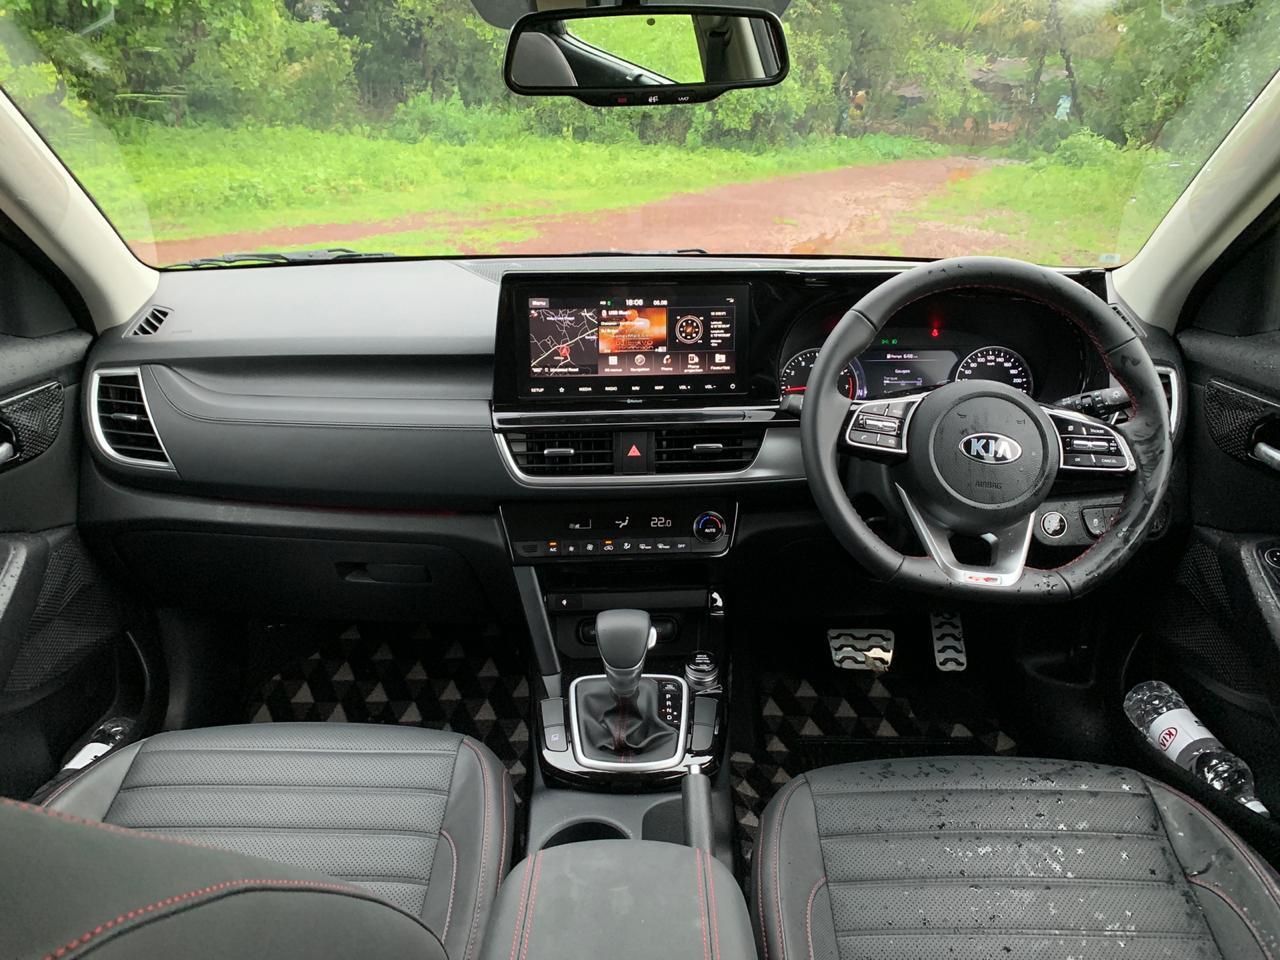 kia-seltos-interior-dashboard-image-9f7a.jpeg